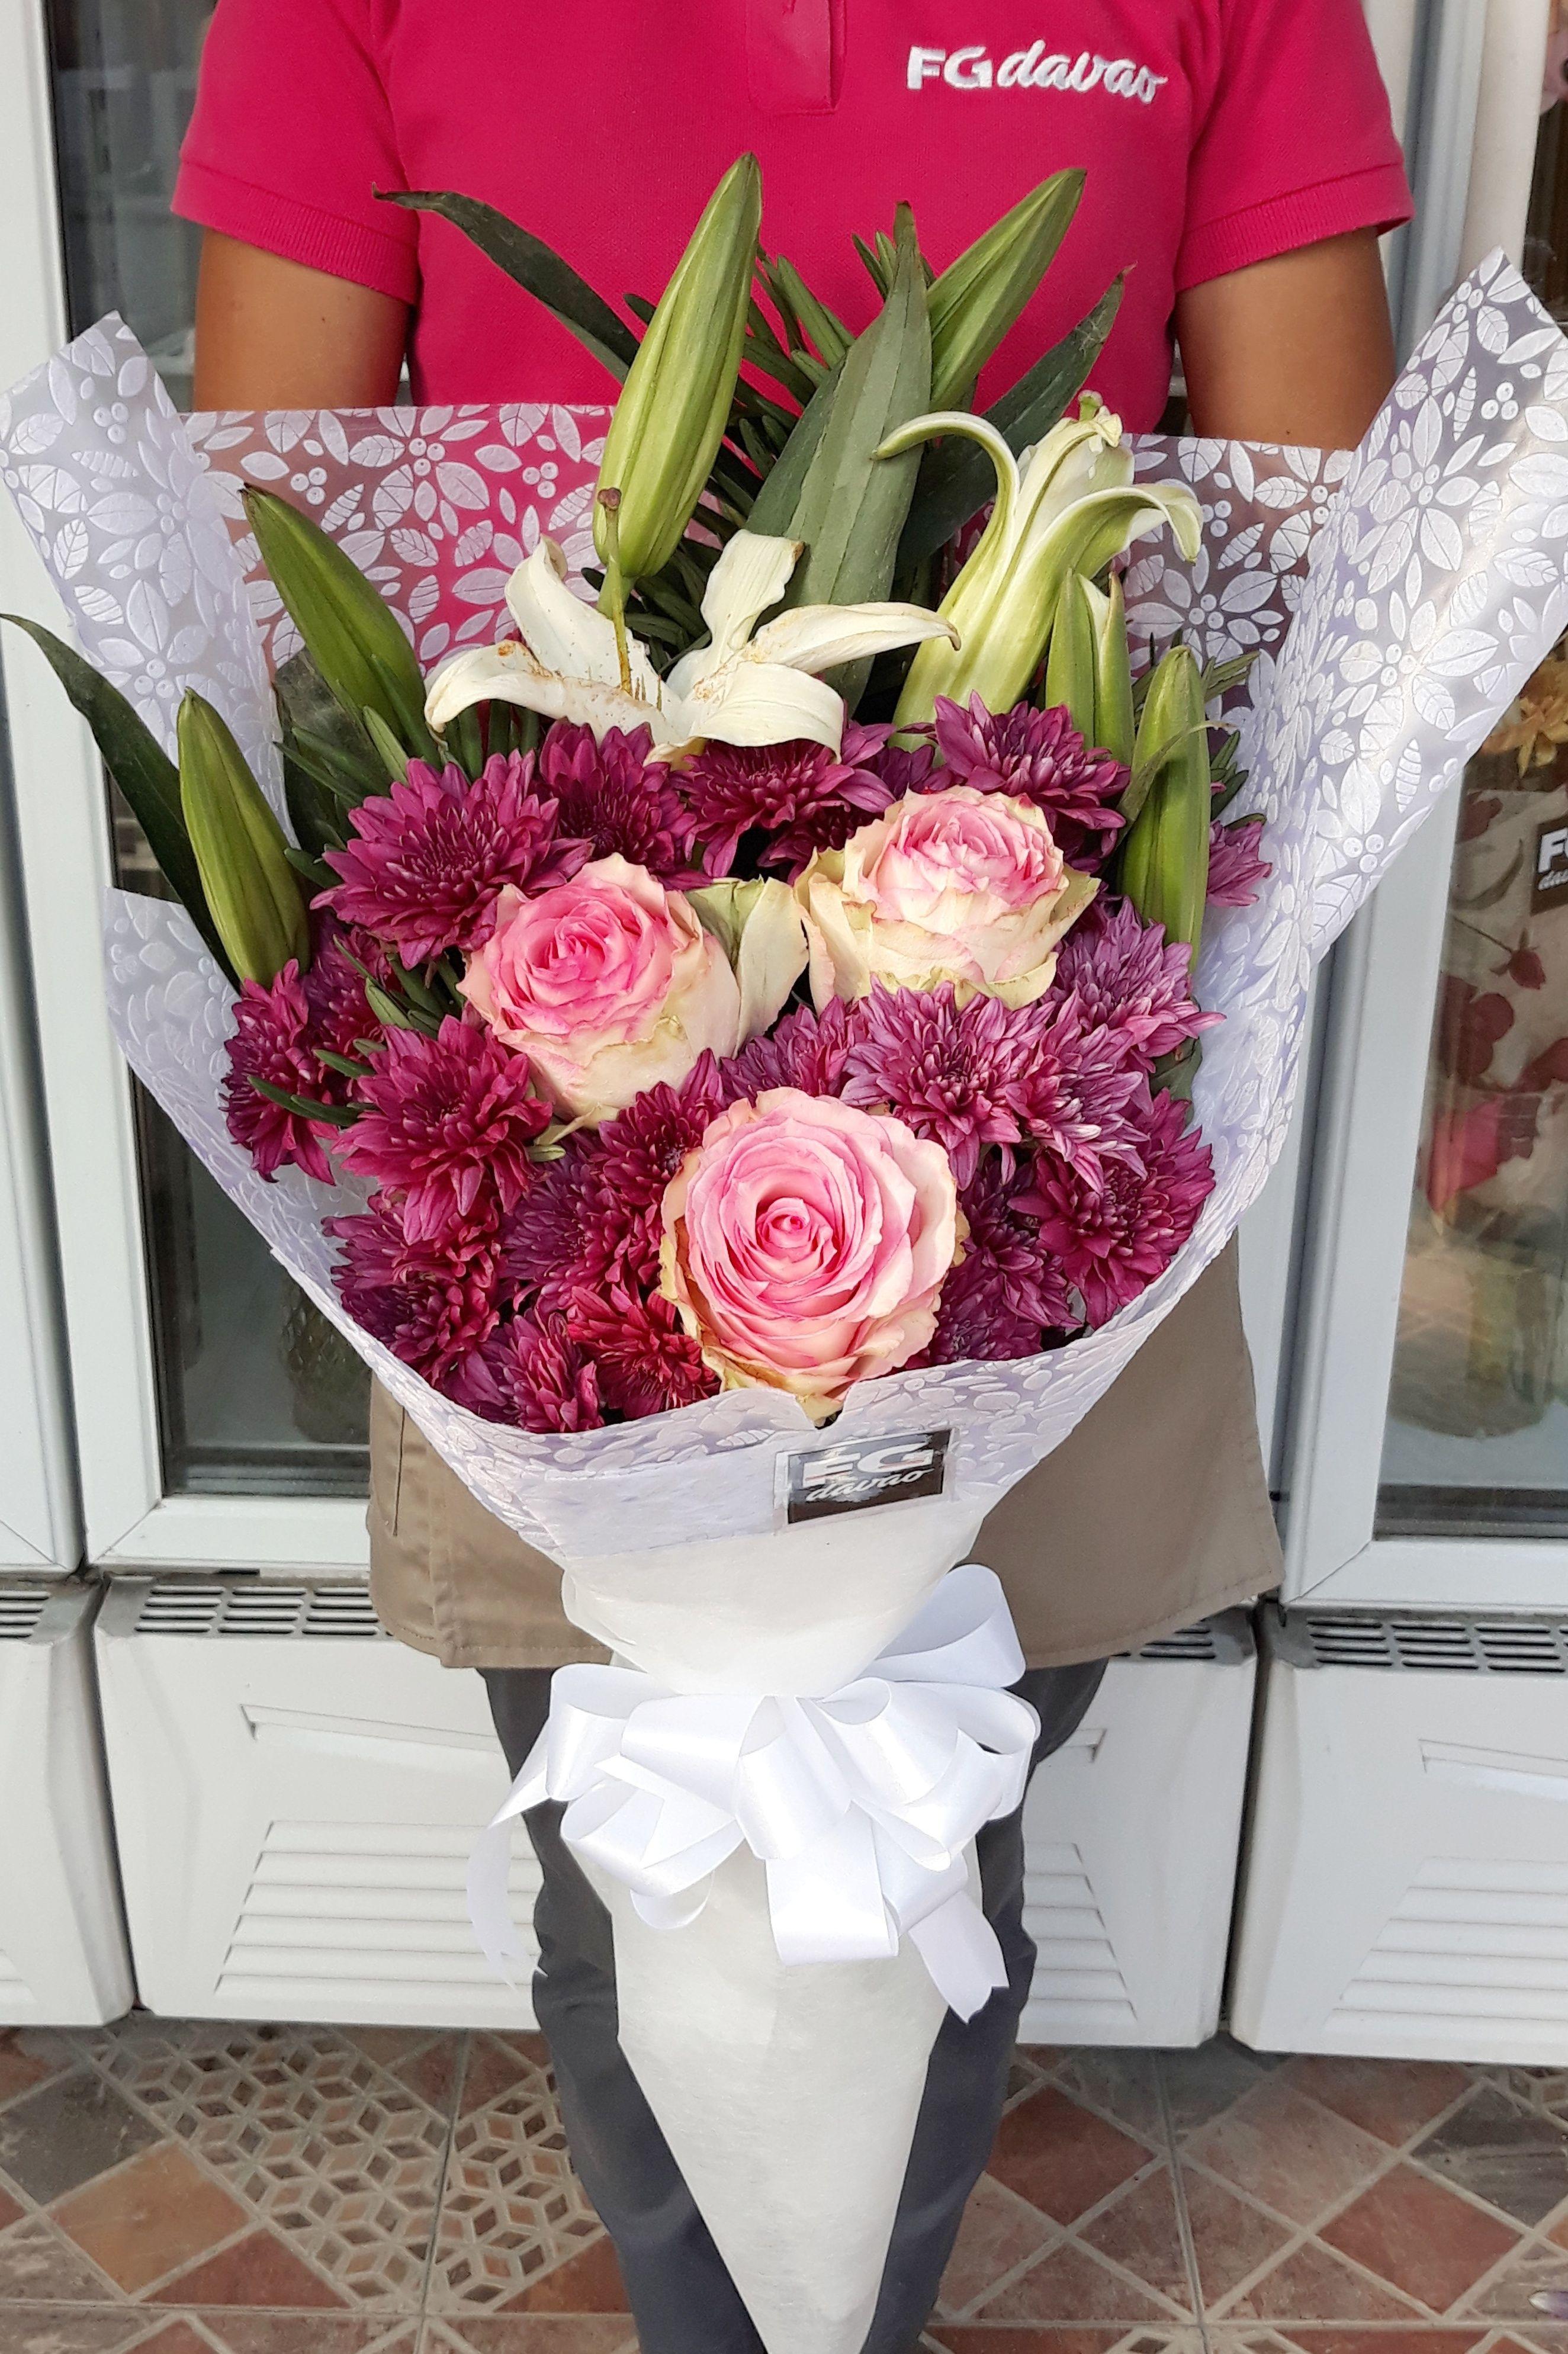 Send Flowers Price List Www Fgdavao Com Fb Page Fg Davao Ig Page Fg Davao Store Address 123 Lopez Jaena St Online Flower Shop Flower Gift Flower Delivery